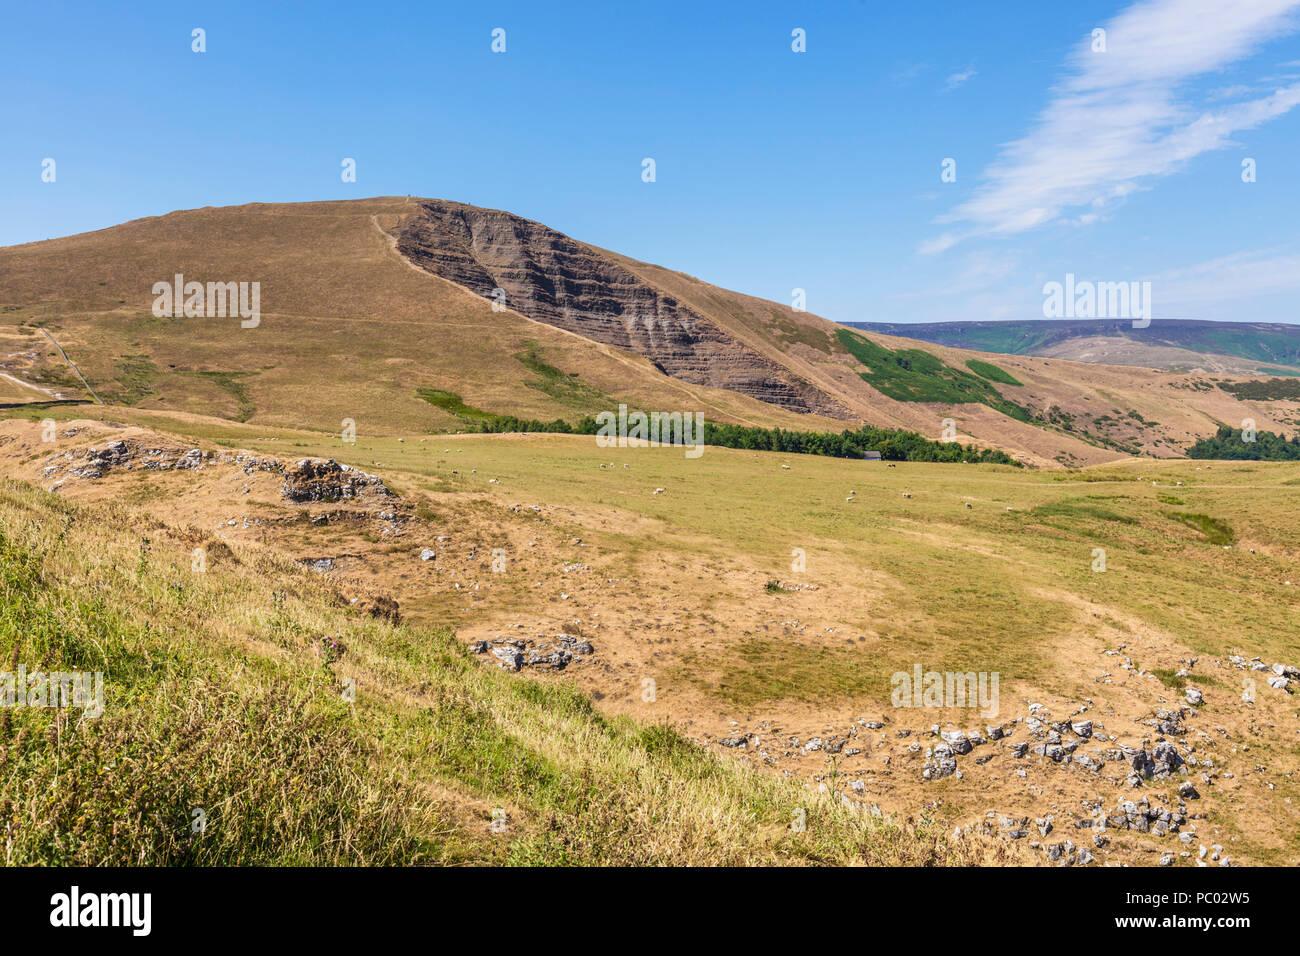 Mam tor a hill near castleton derbyshire peak district national park derbyshire england uk gb europe - Stock Image